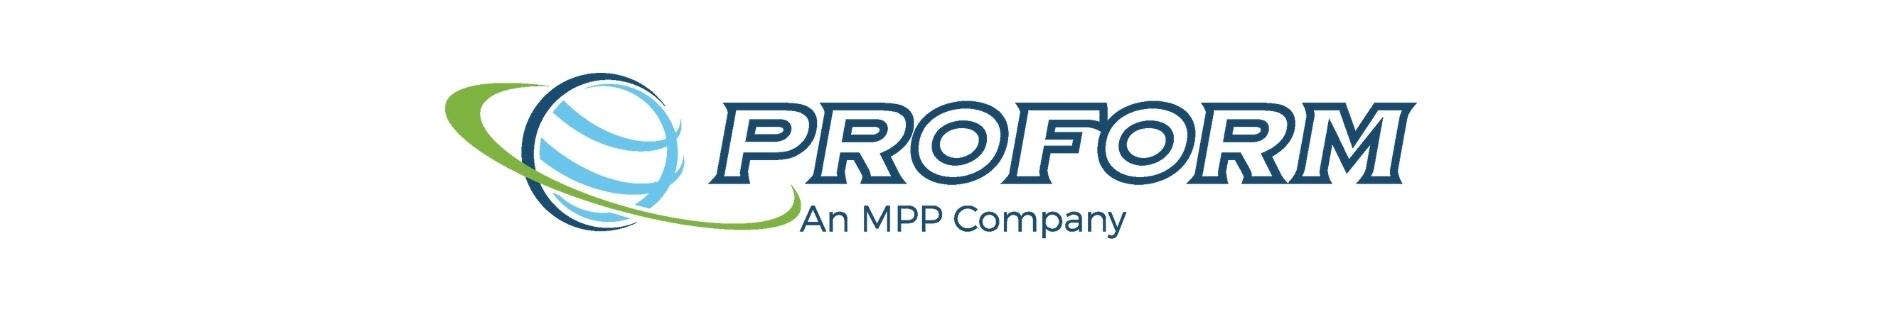 Proform Banner